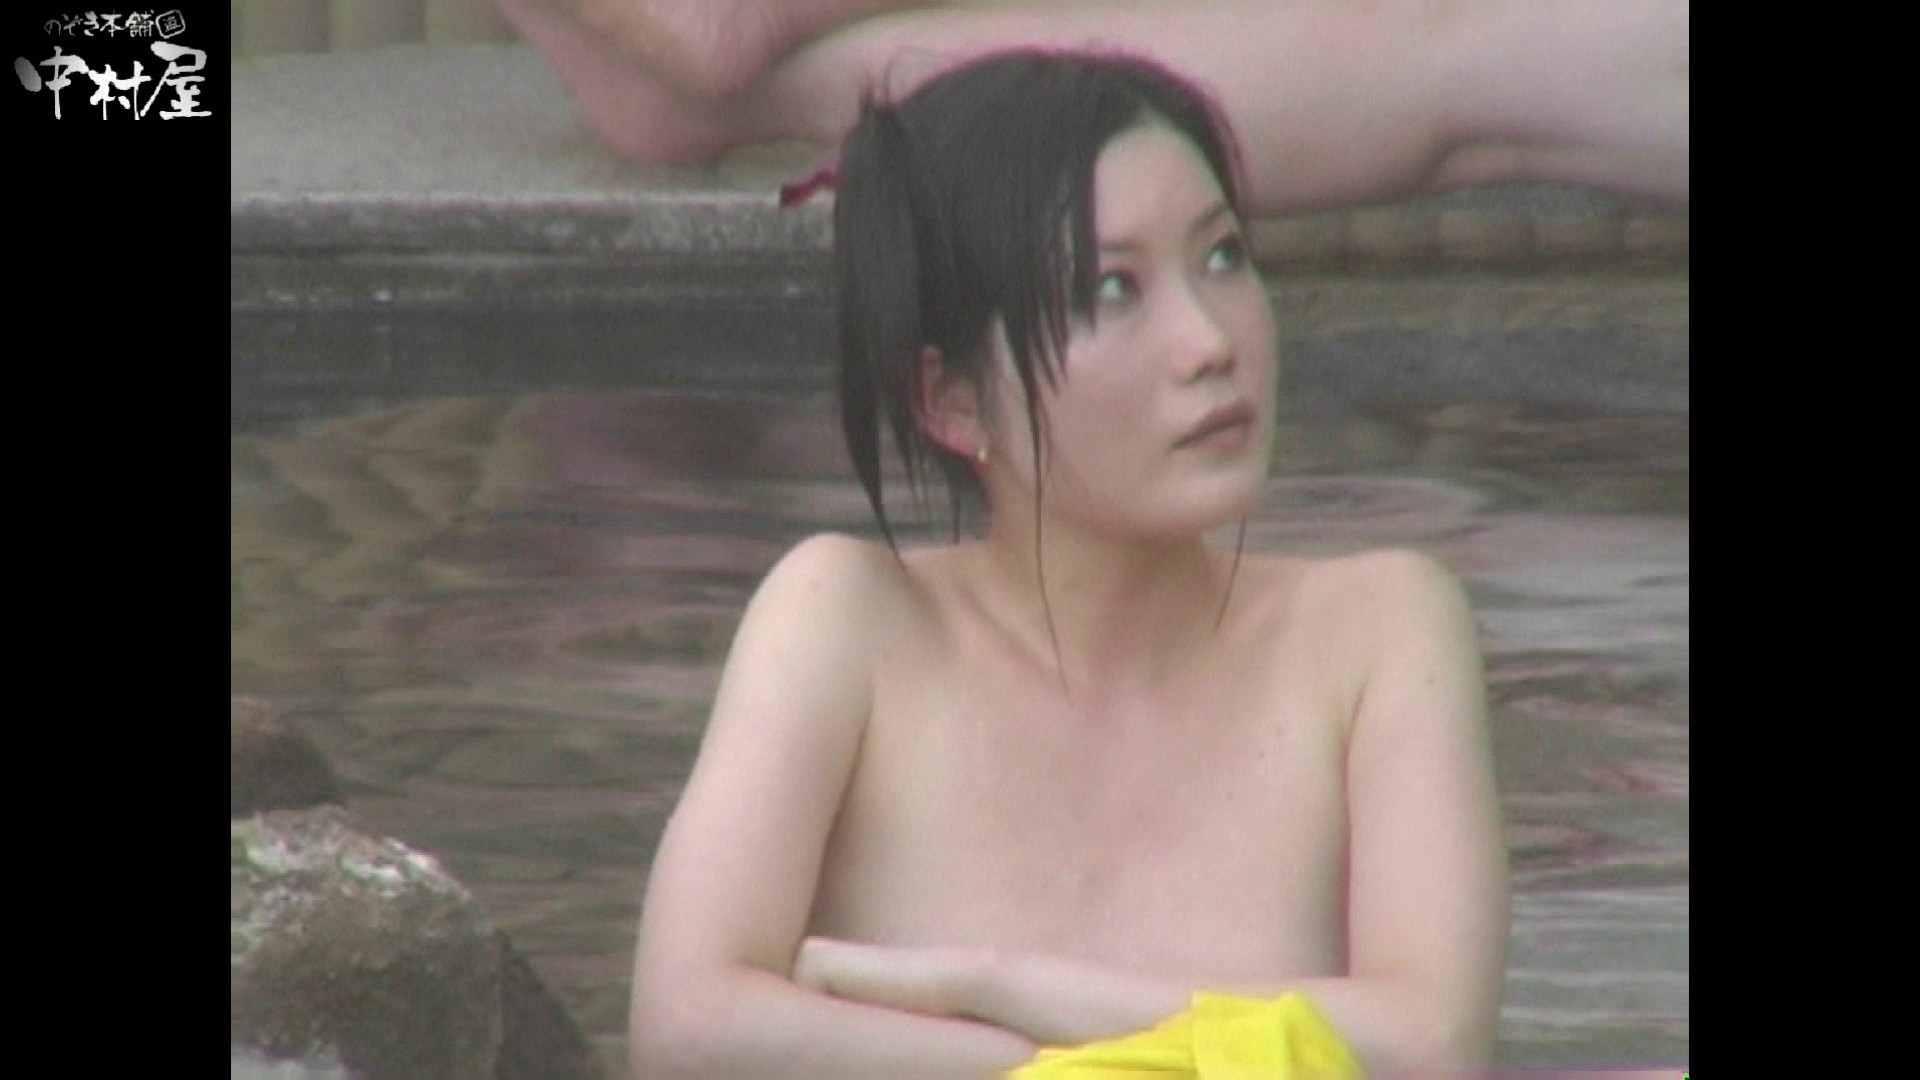 Aquaな露天風呂Vol.940 盗撮  47連発 21